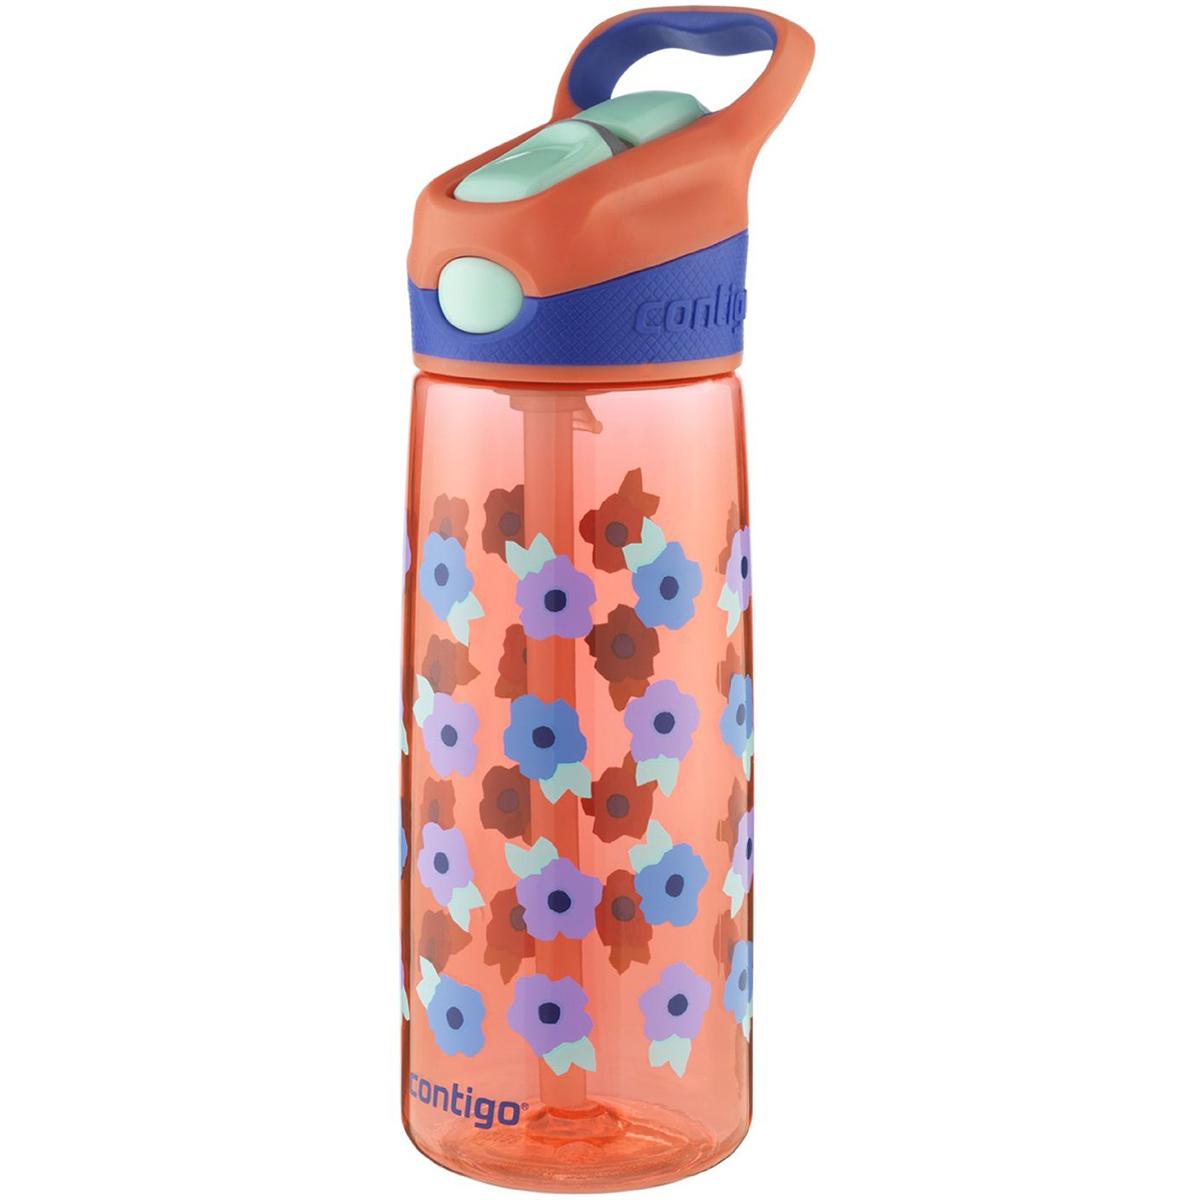 Contigo-20-oz-Kid-039-s-Striker-Autospout-Water-Bottle miniatuur 10